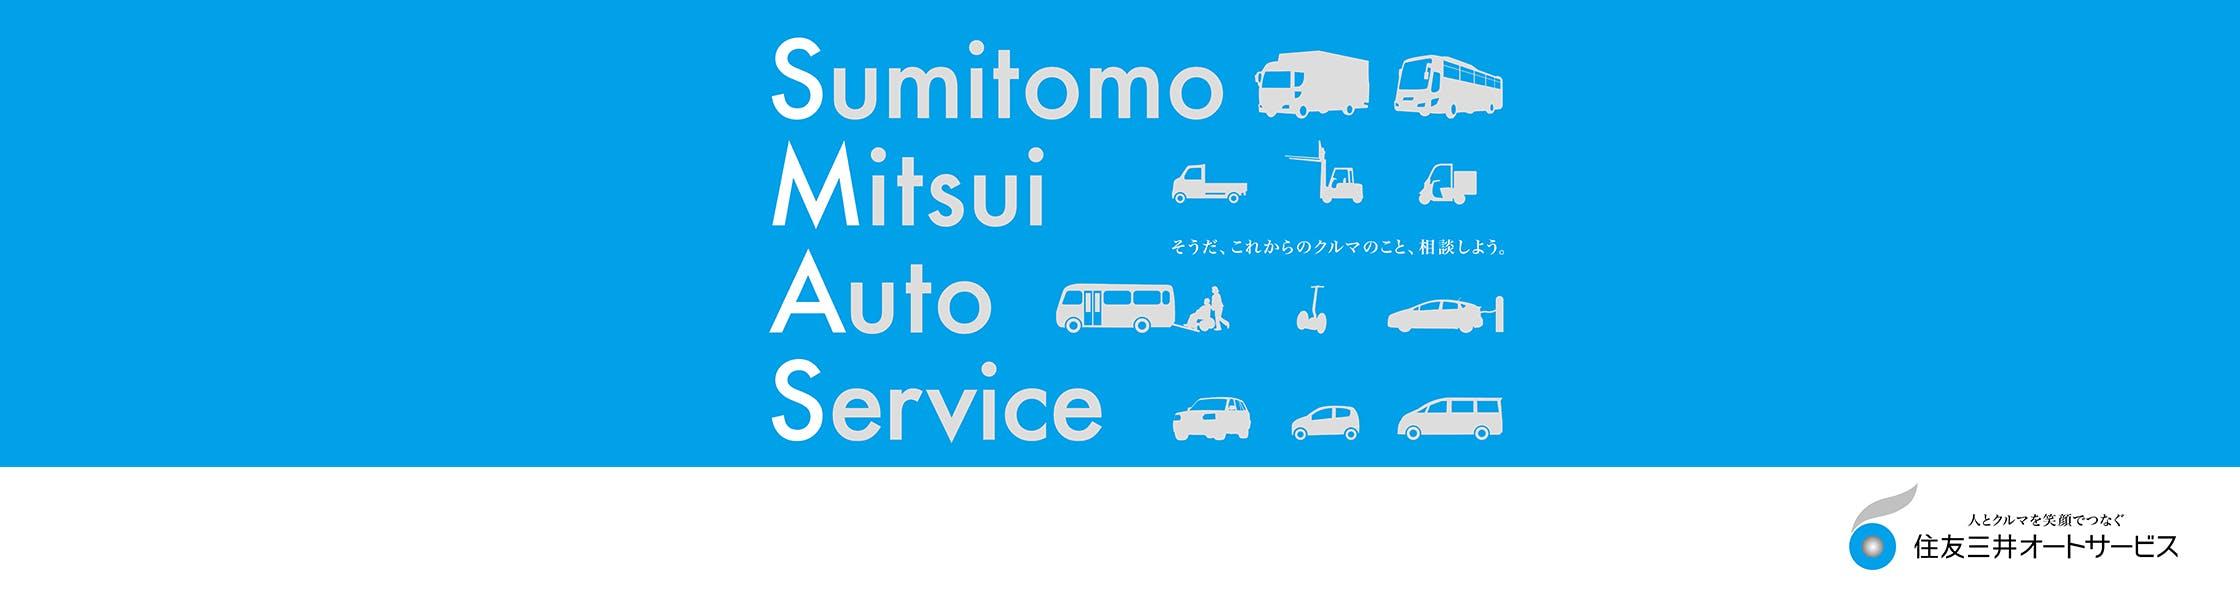 Sumitomomitsuiauto 1120x300 2x.jpg?ixlib=rails 3.0